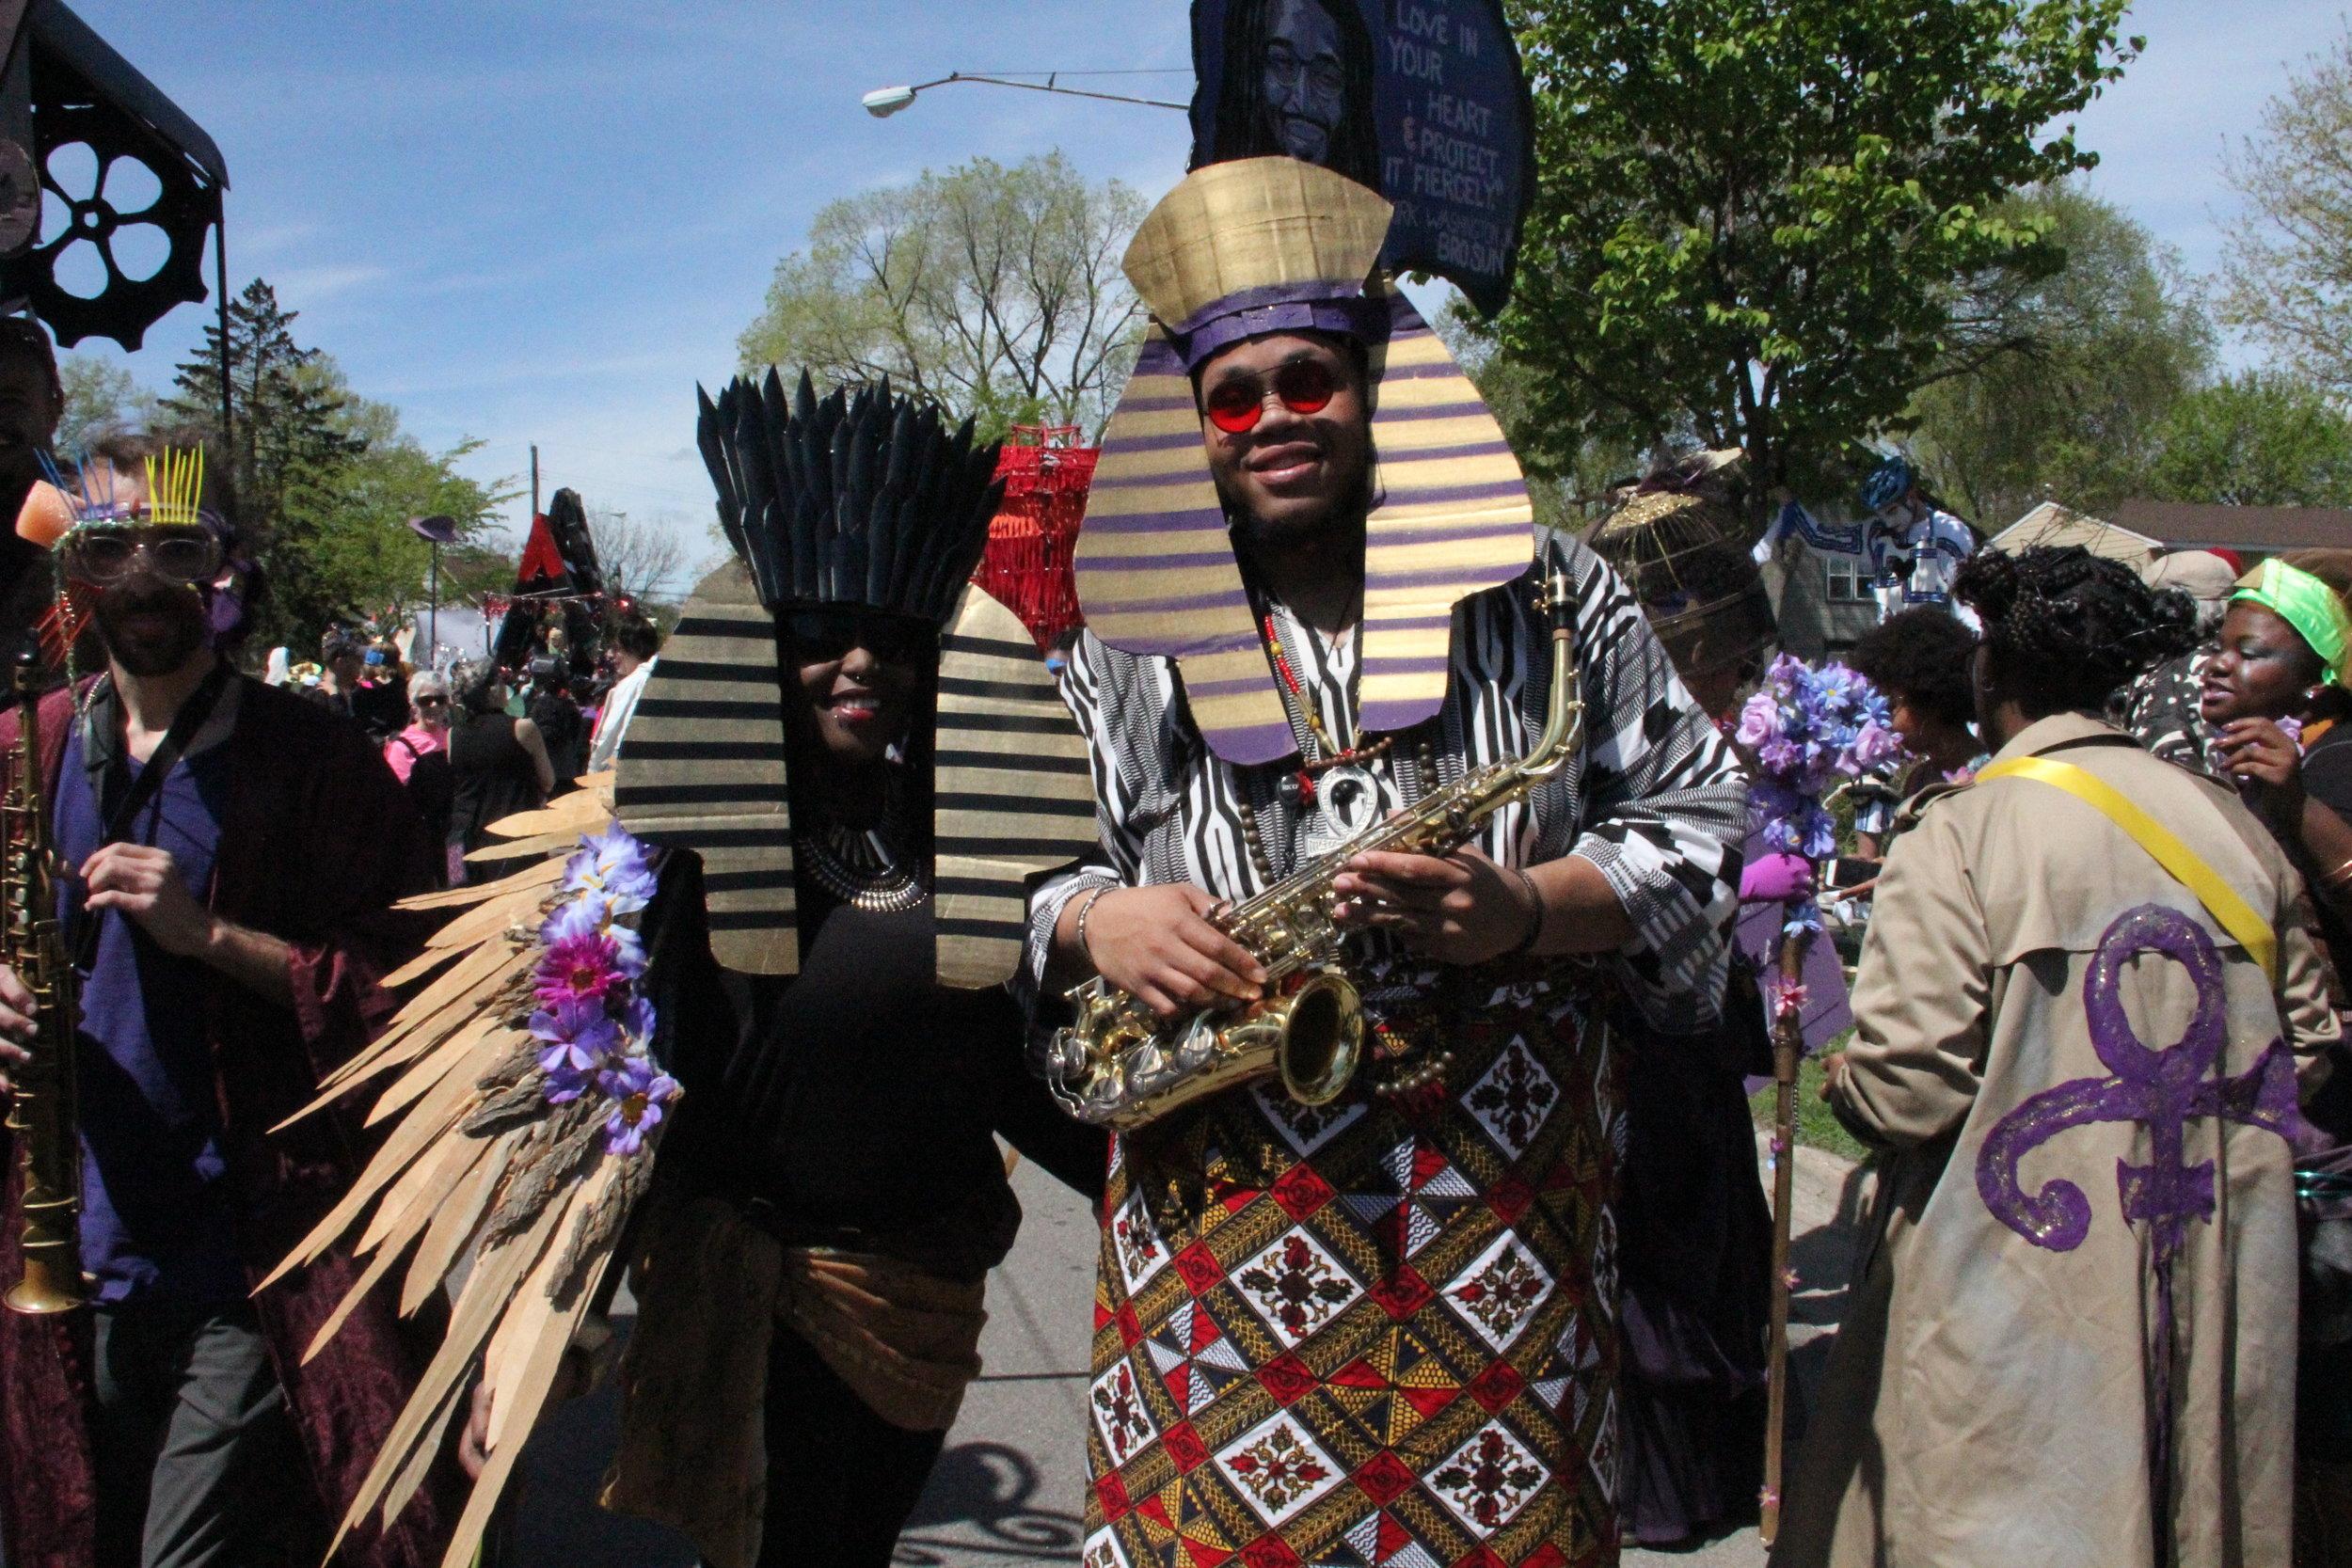 Adja & Myke, Wild Seed, MayDay parade 2016